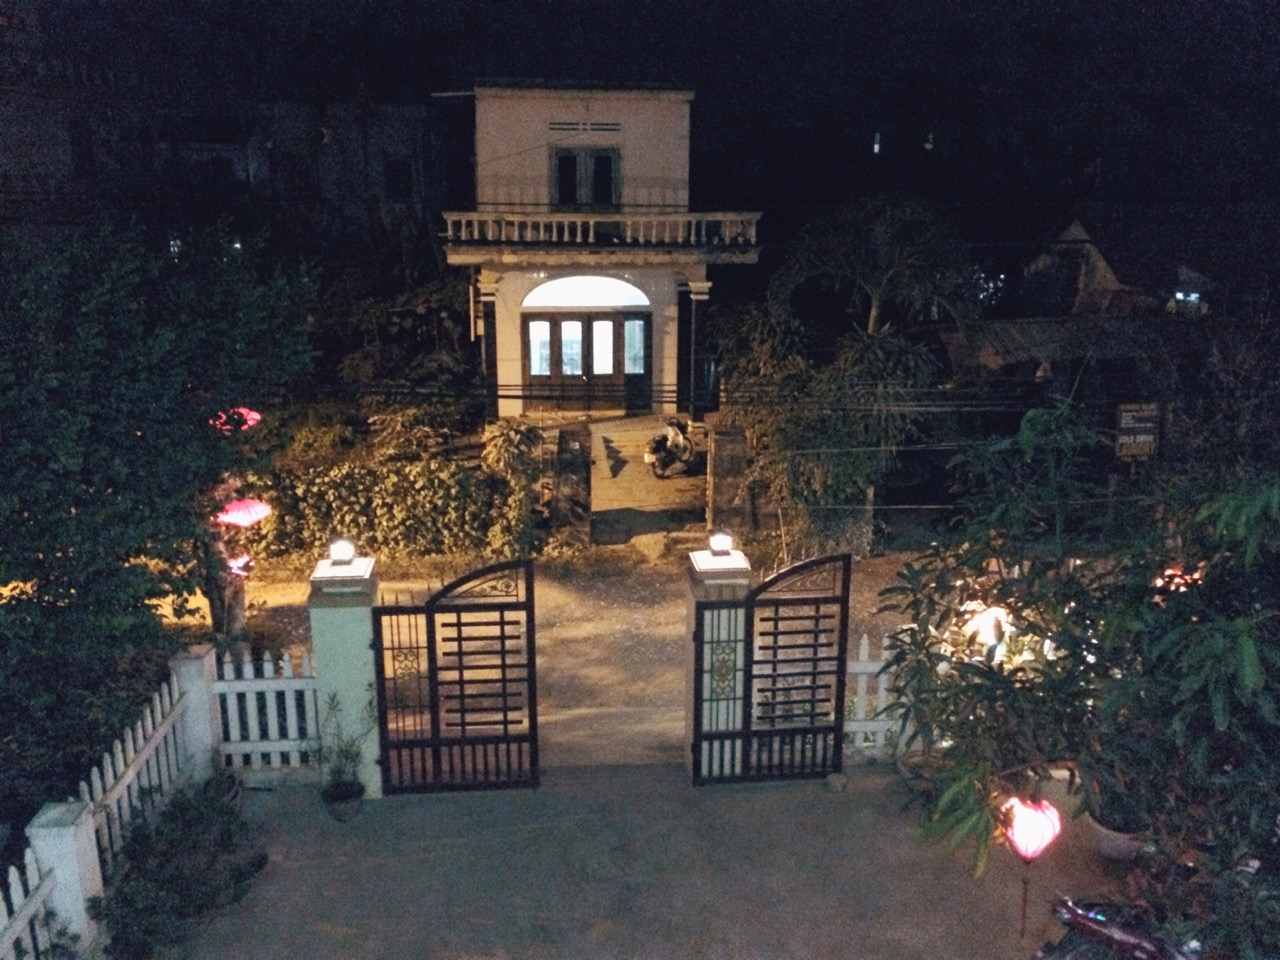 Путешествие по Вьетнаму: Вид с балкона, хоумстей в Хойане